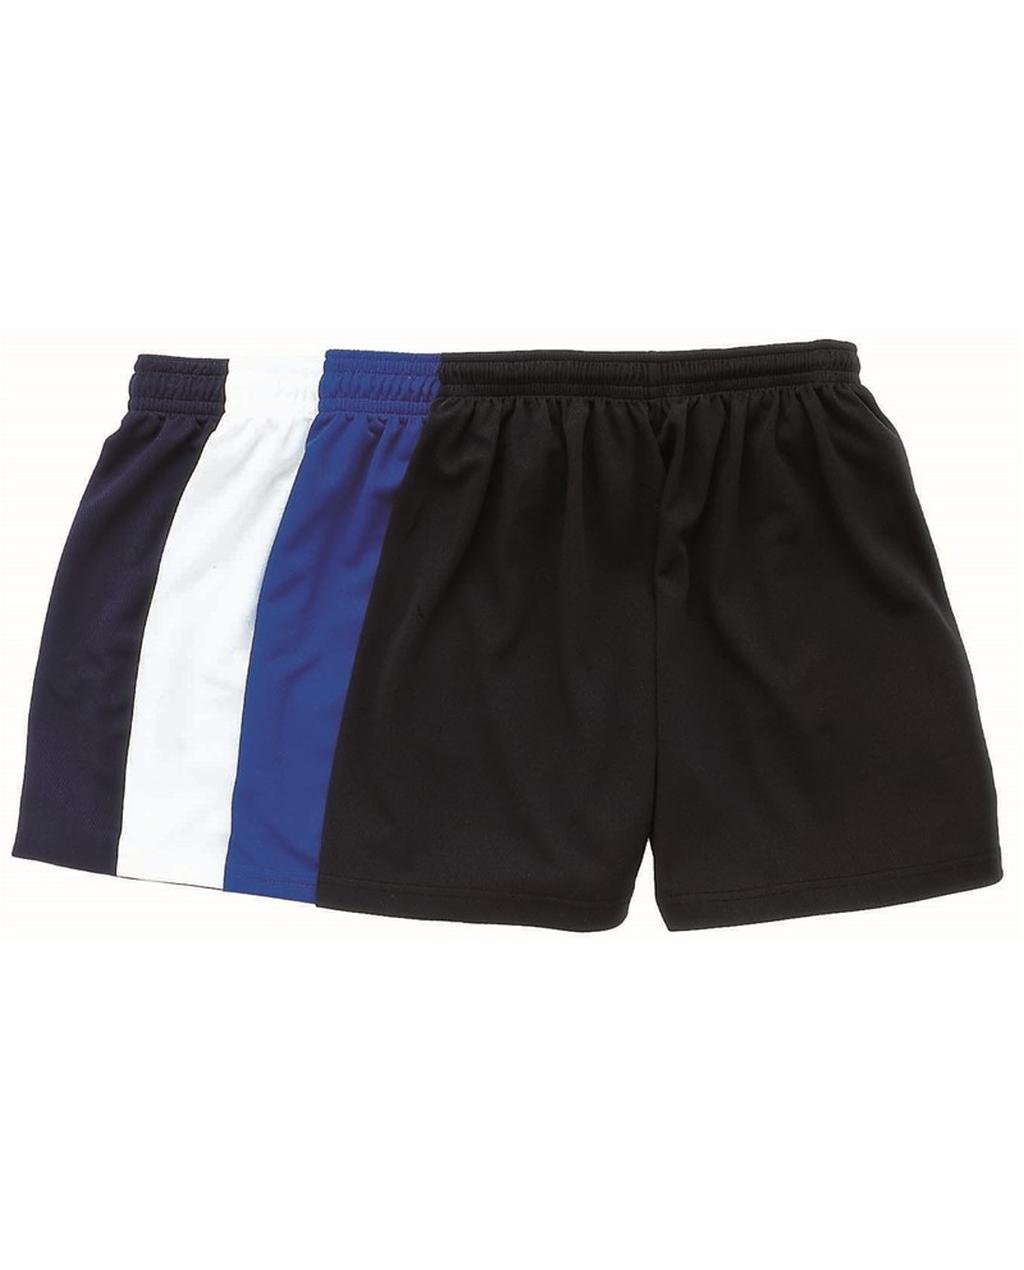 Football Shorts - 22